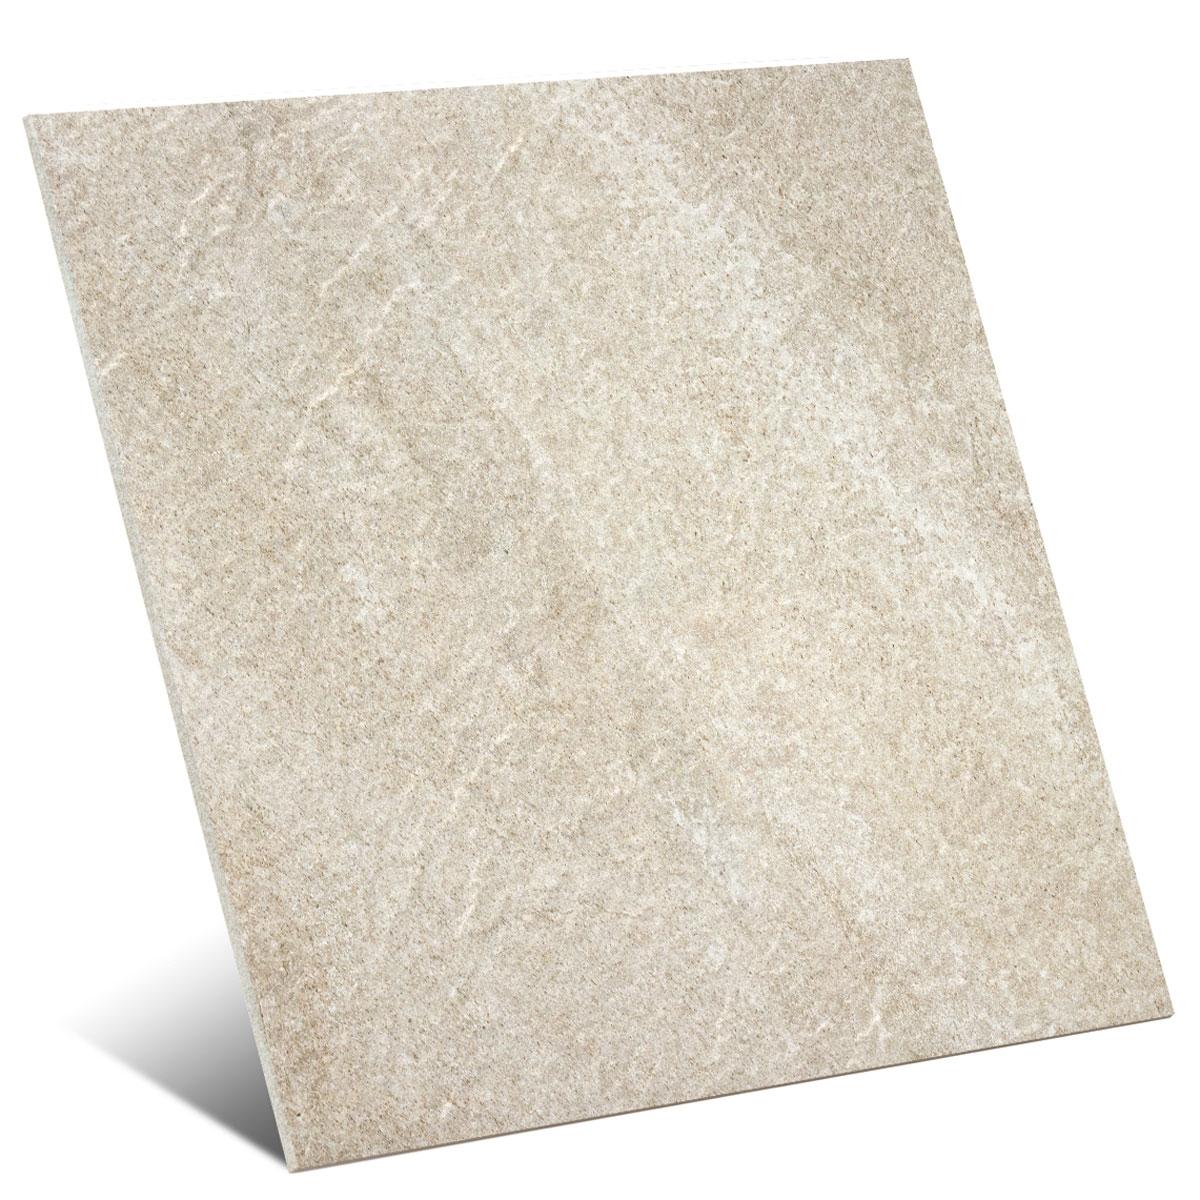 Icaria Beige 60x60 20mm (caja 0.70 m2)